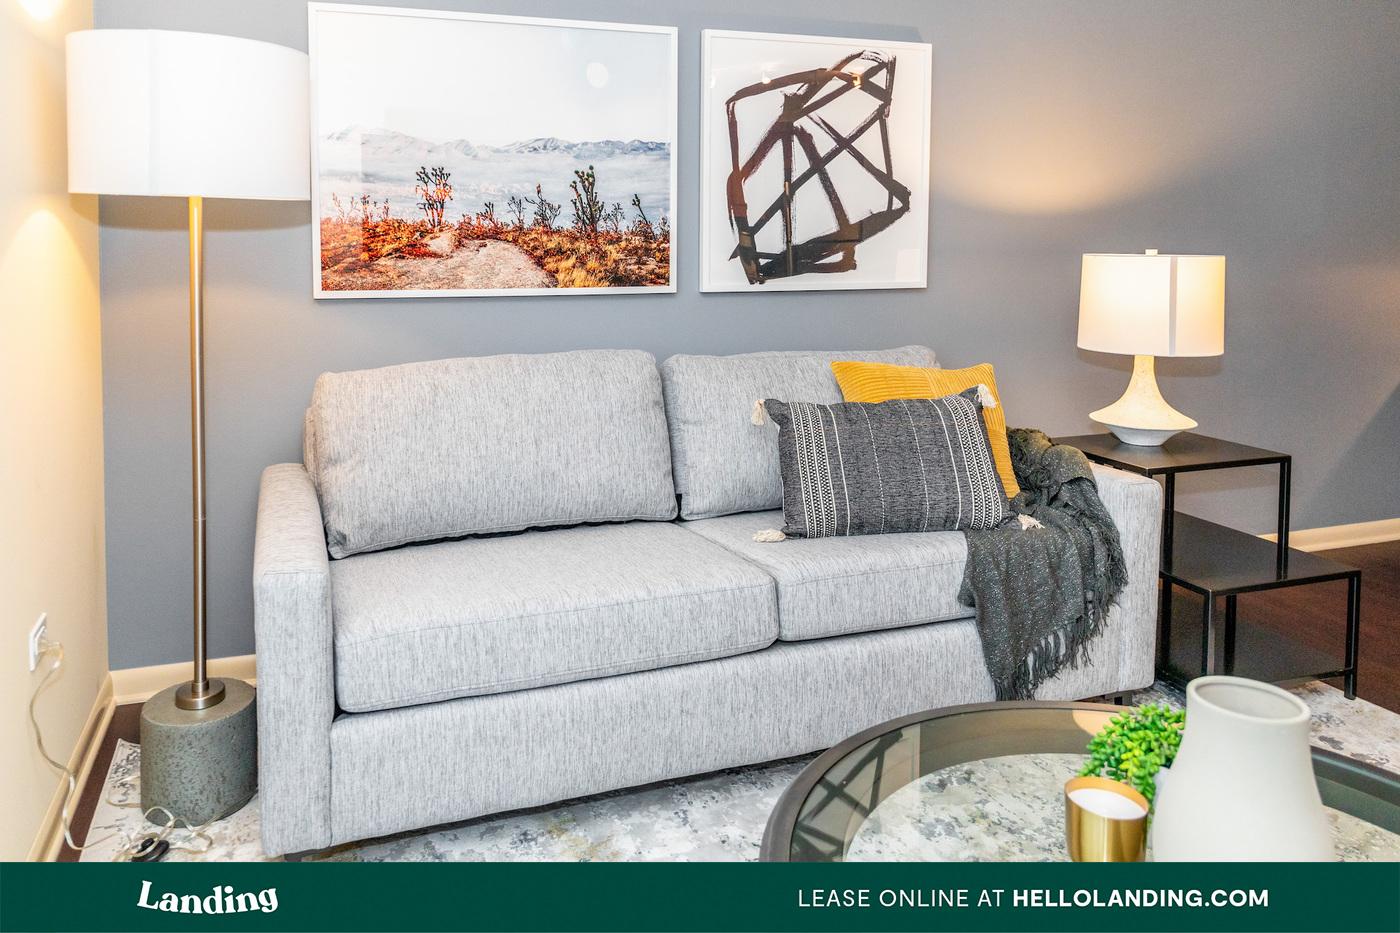 215 West Apartments rental